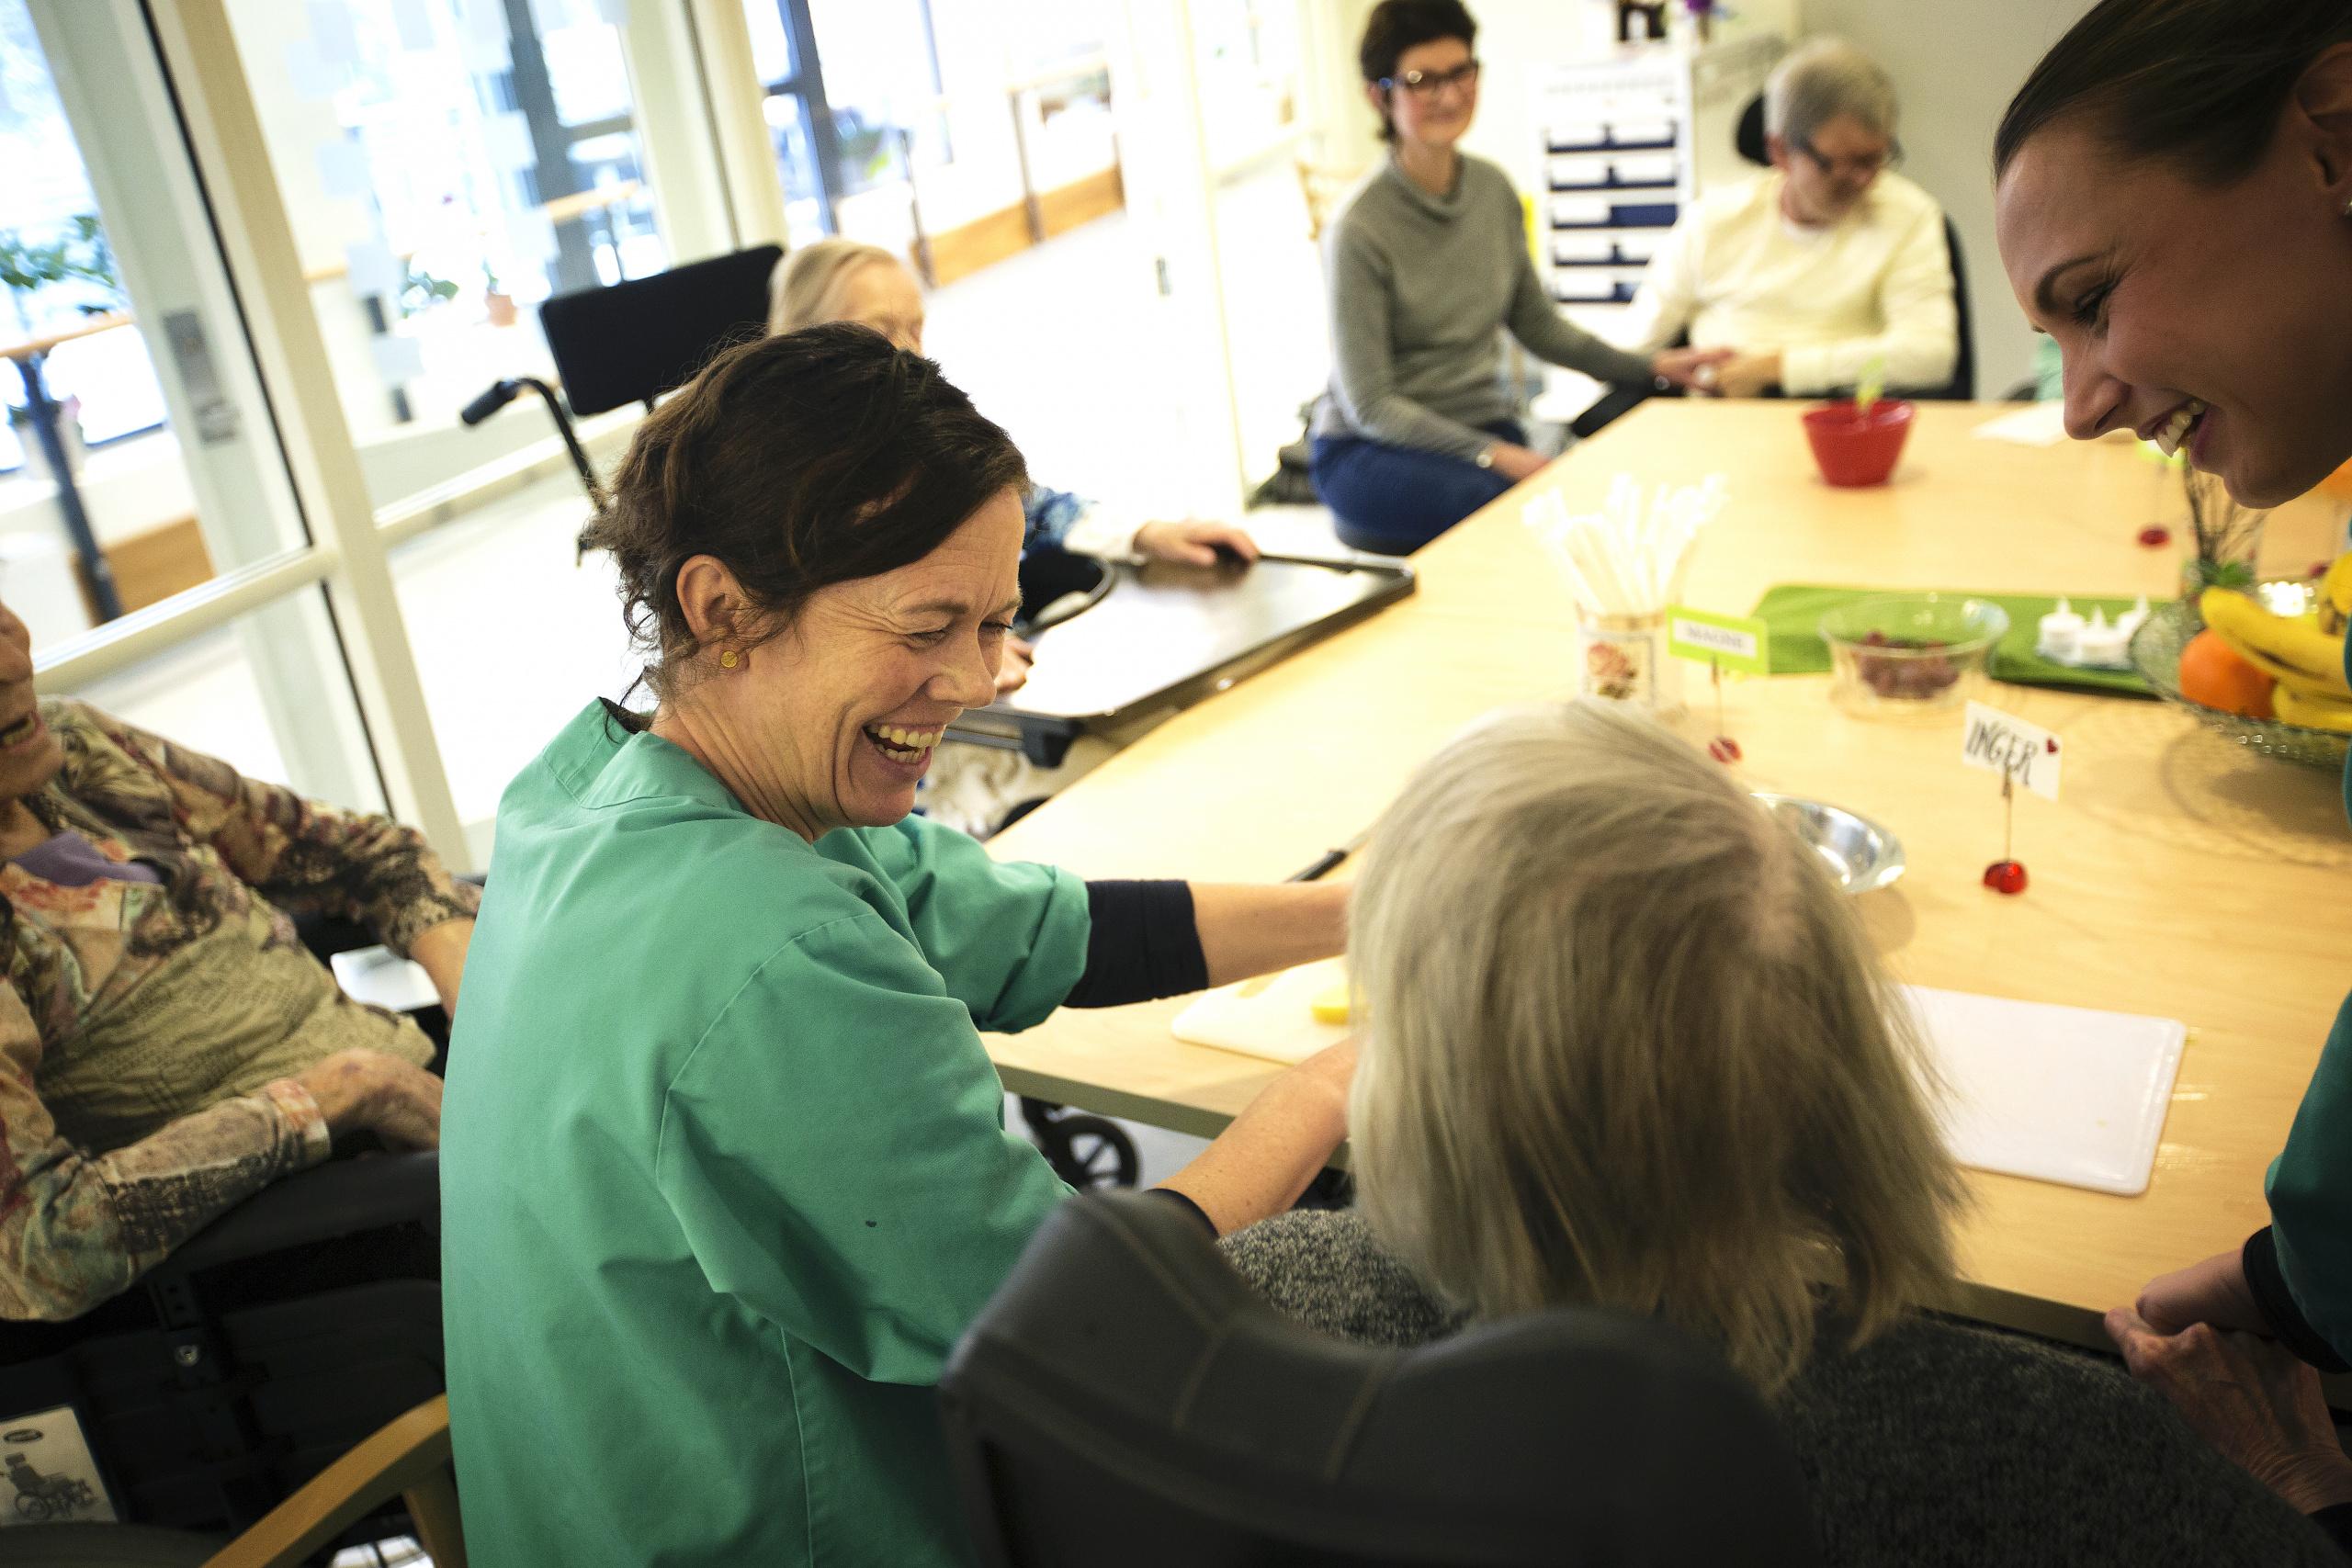 Helsearbeider smiler til eldre person